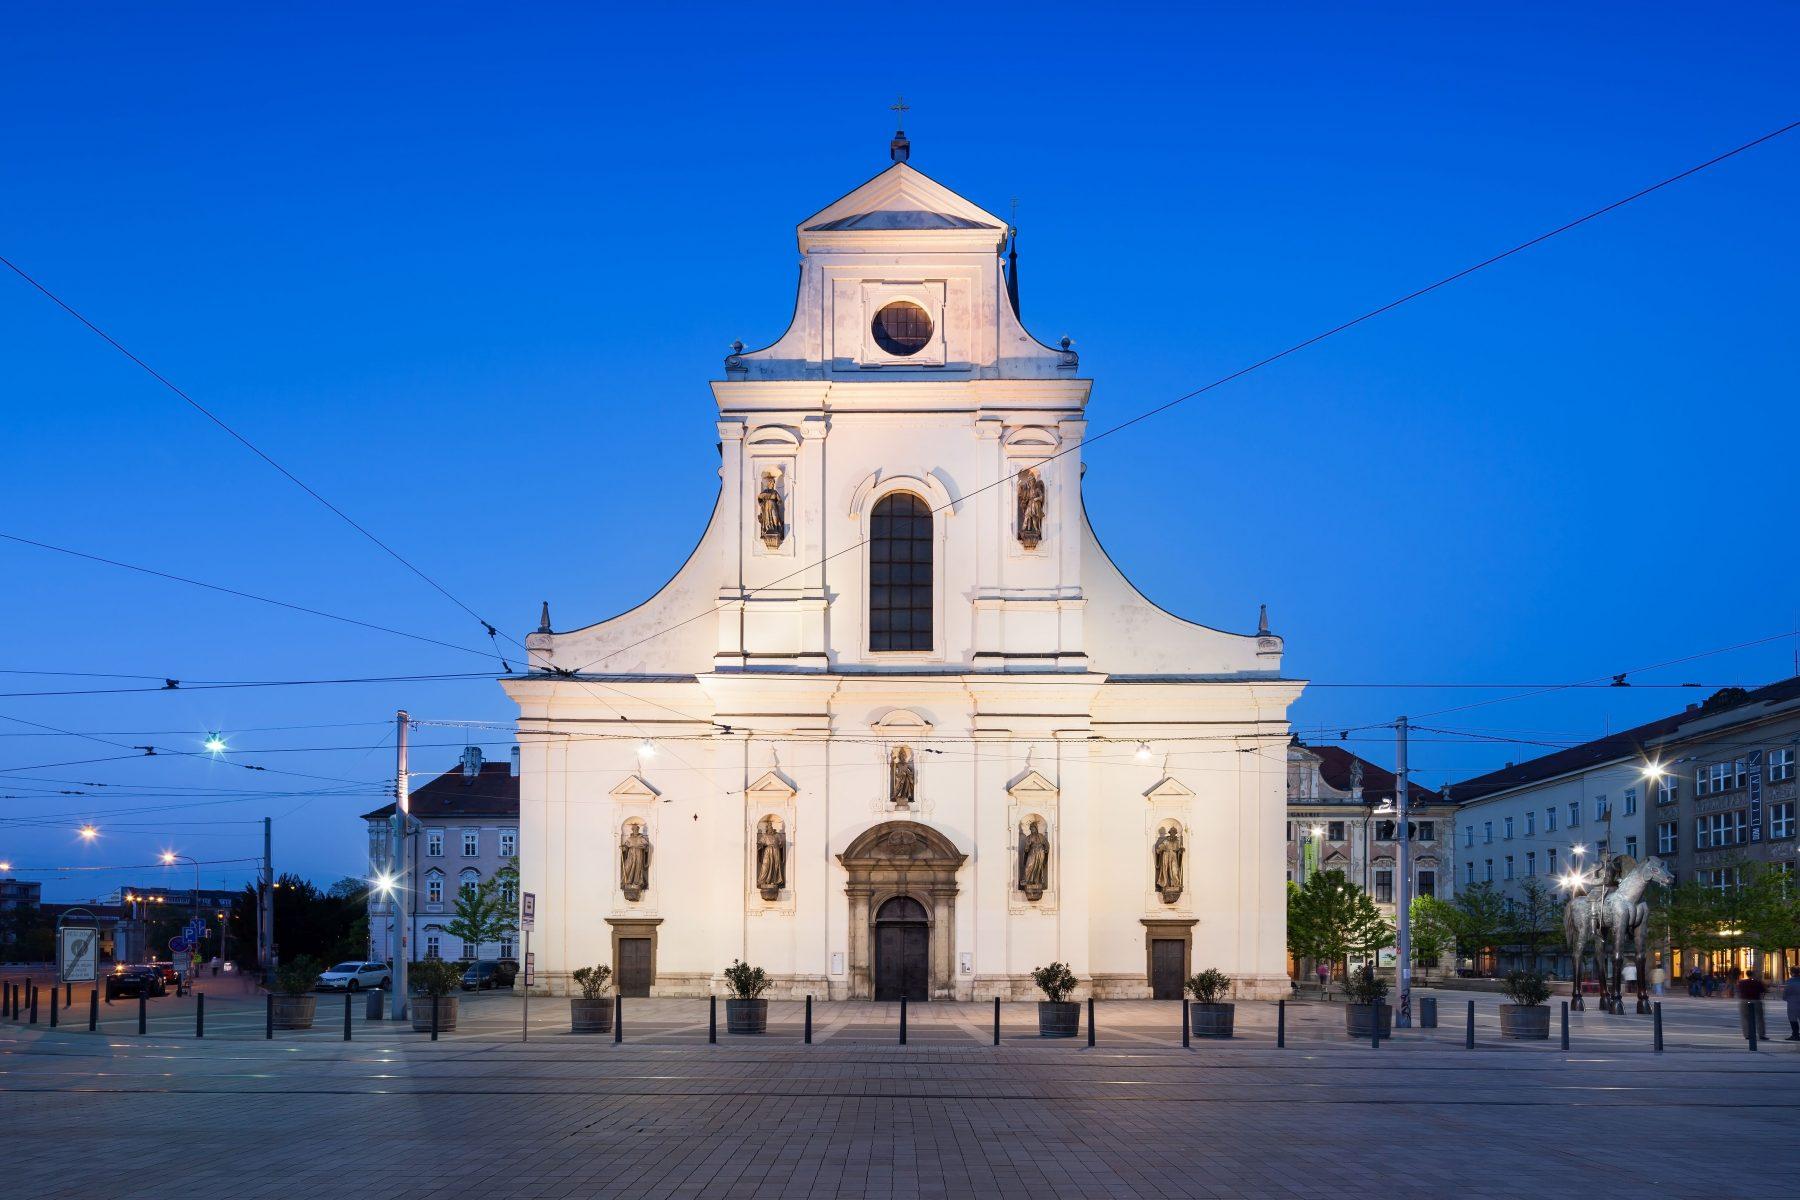 St. Thomas church in Brno